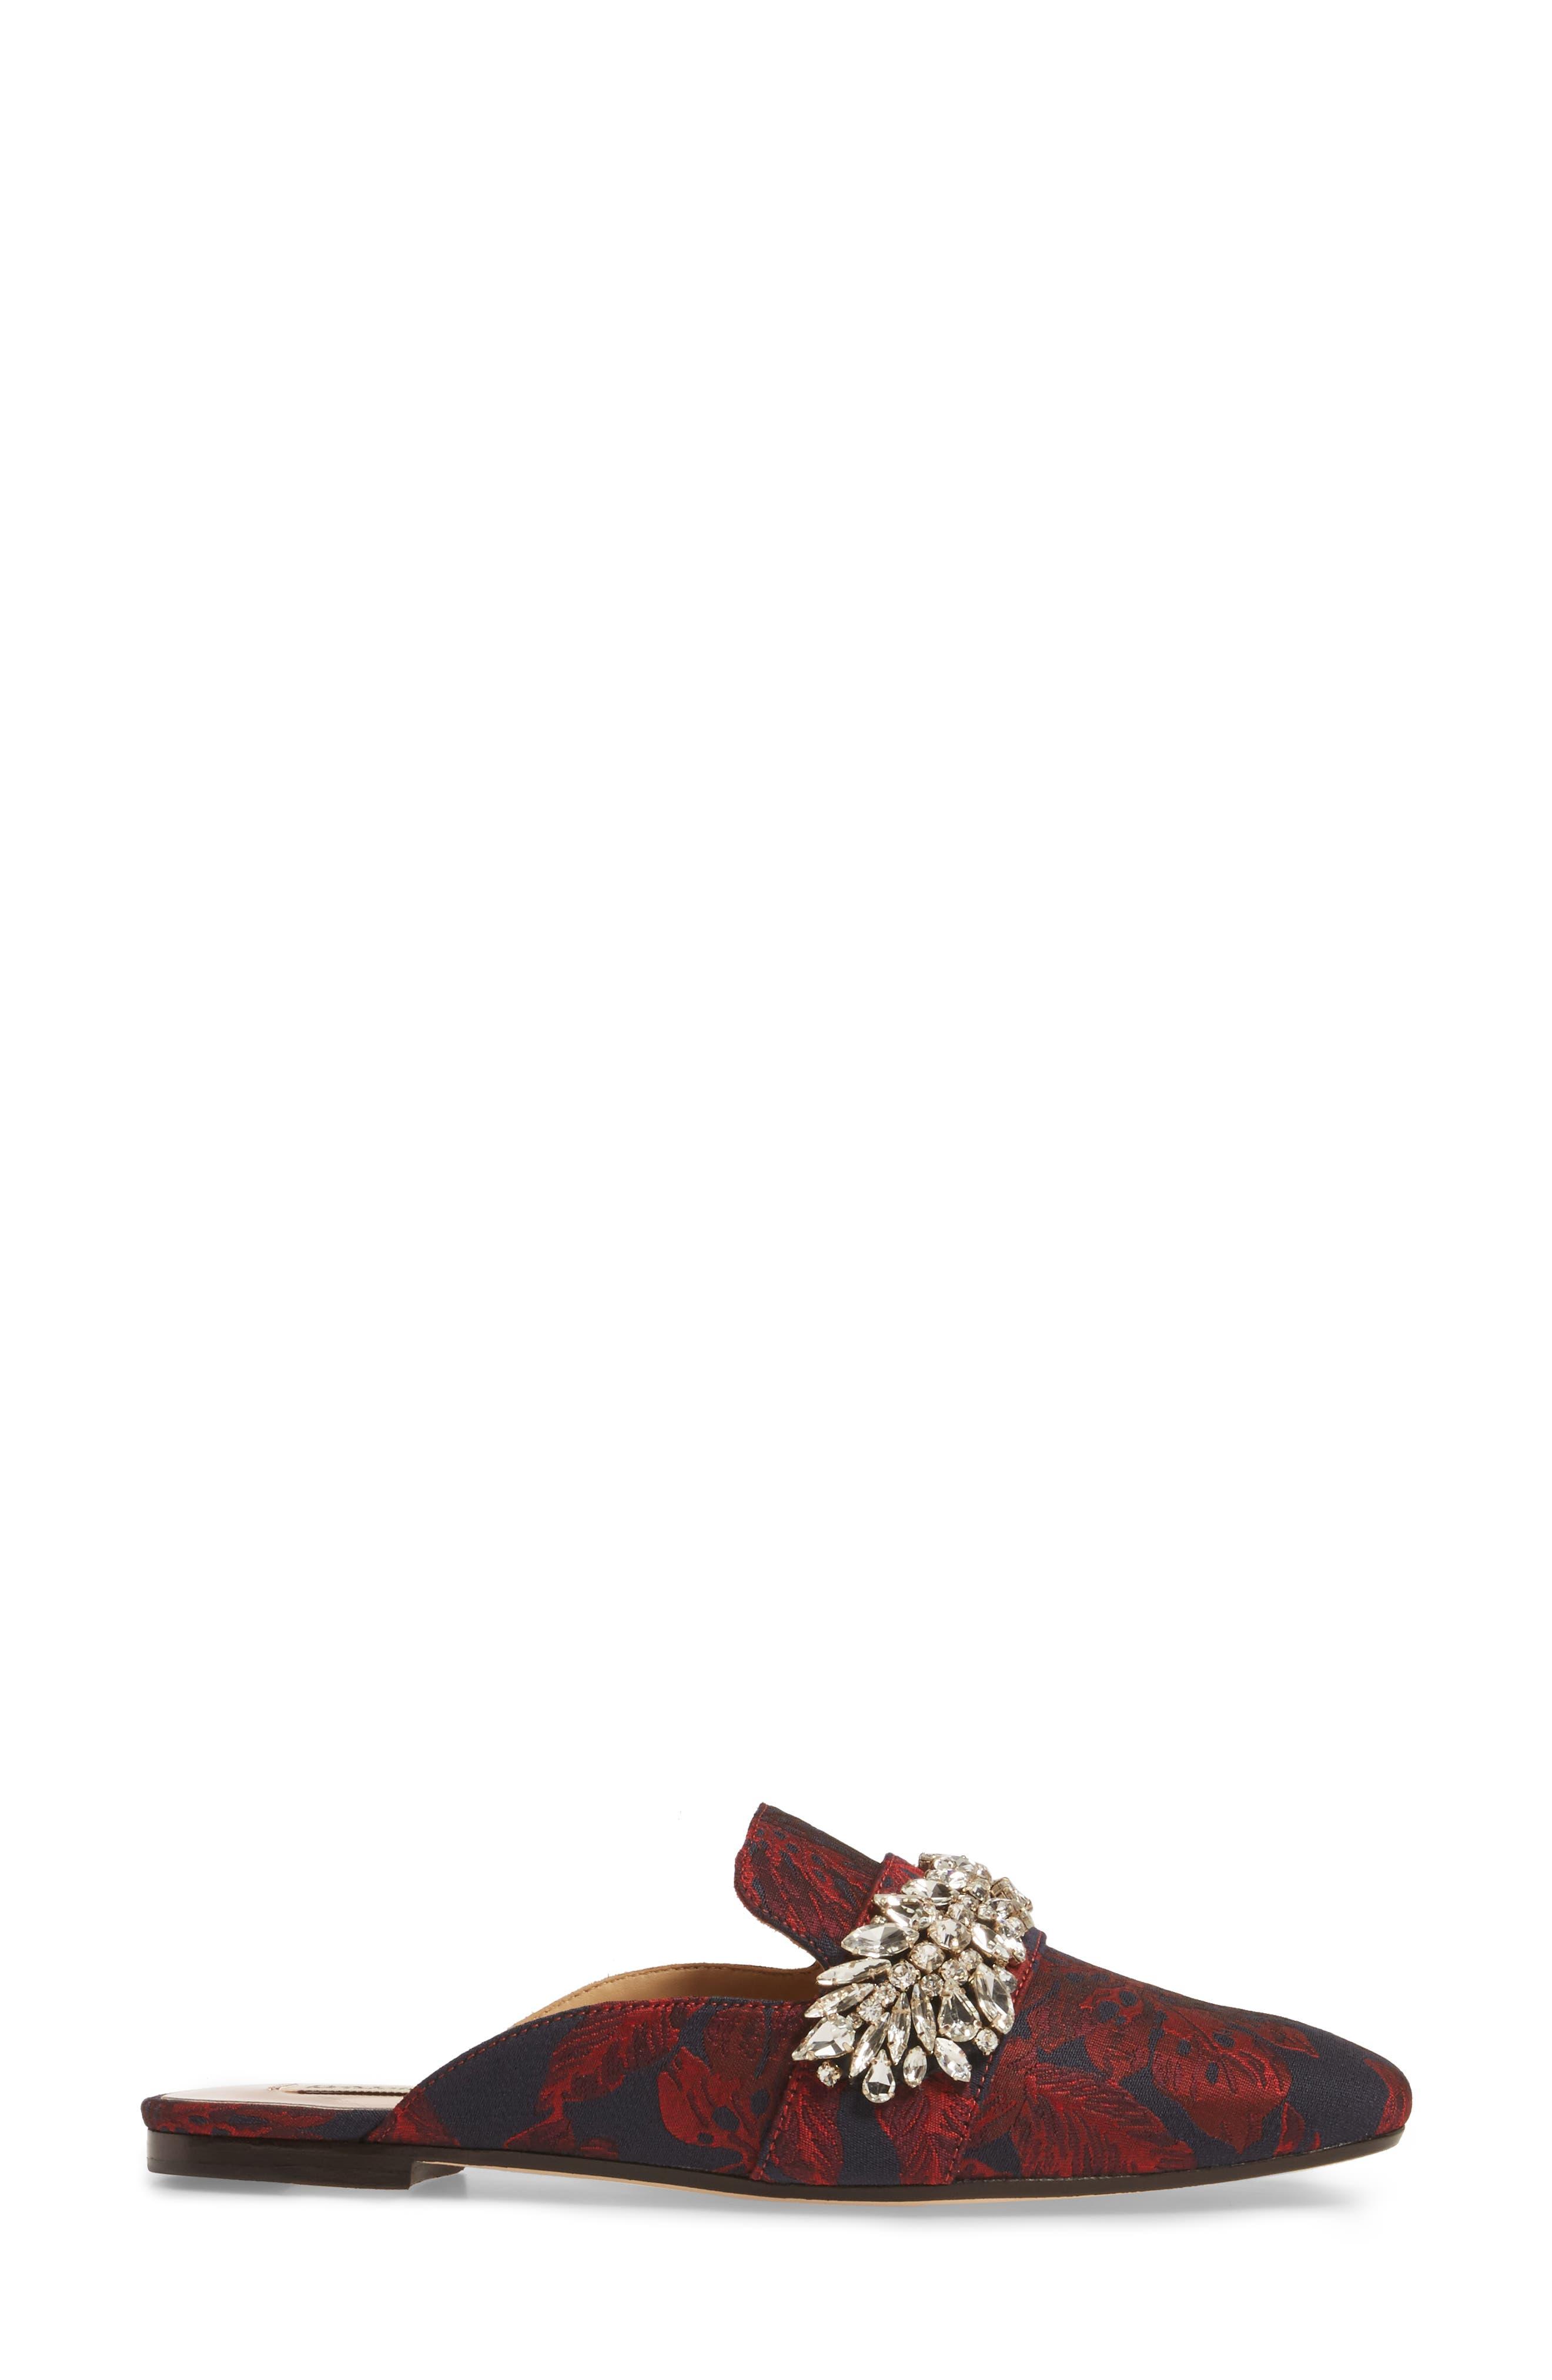 Kana Embellished Loafer Mule,                             Alternate thumbnail 3, color,                             Burgundy Fabric